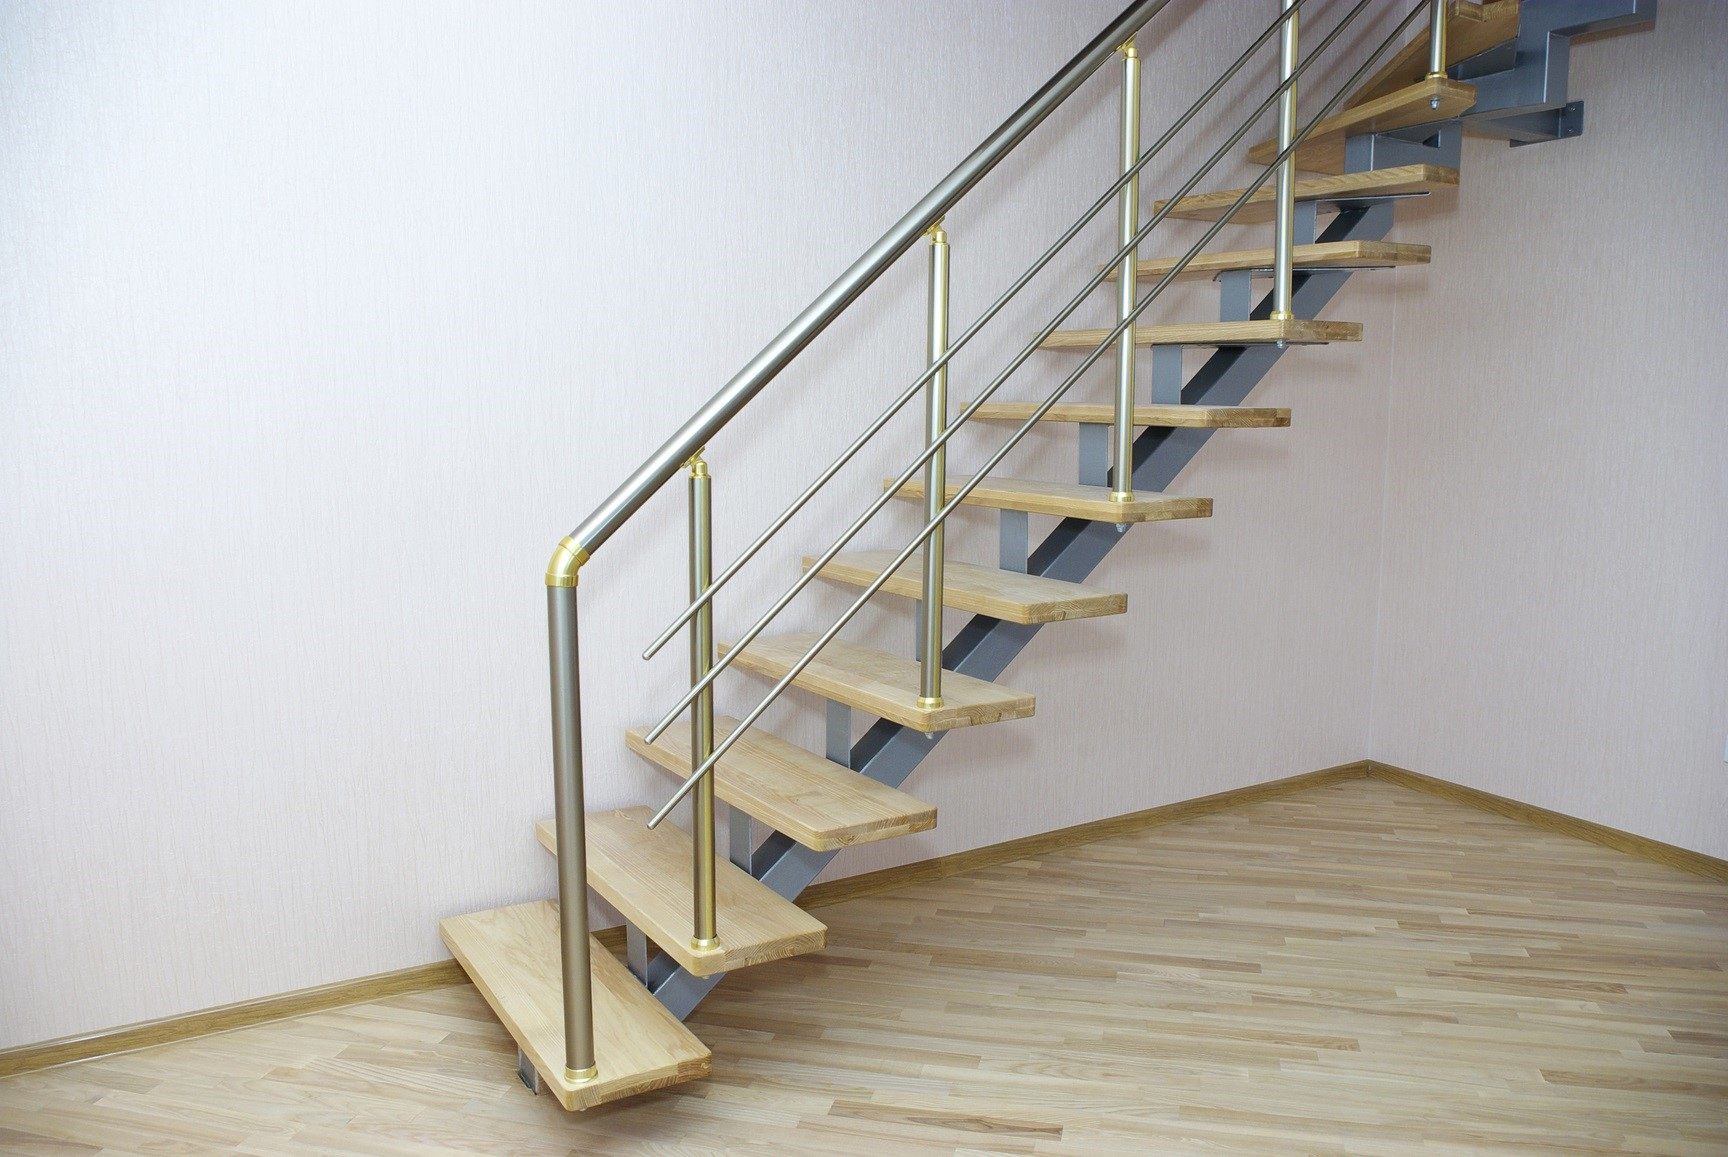 Escalier droit inox & bois.